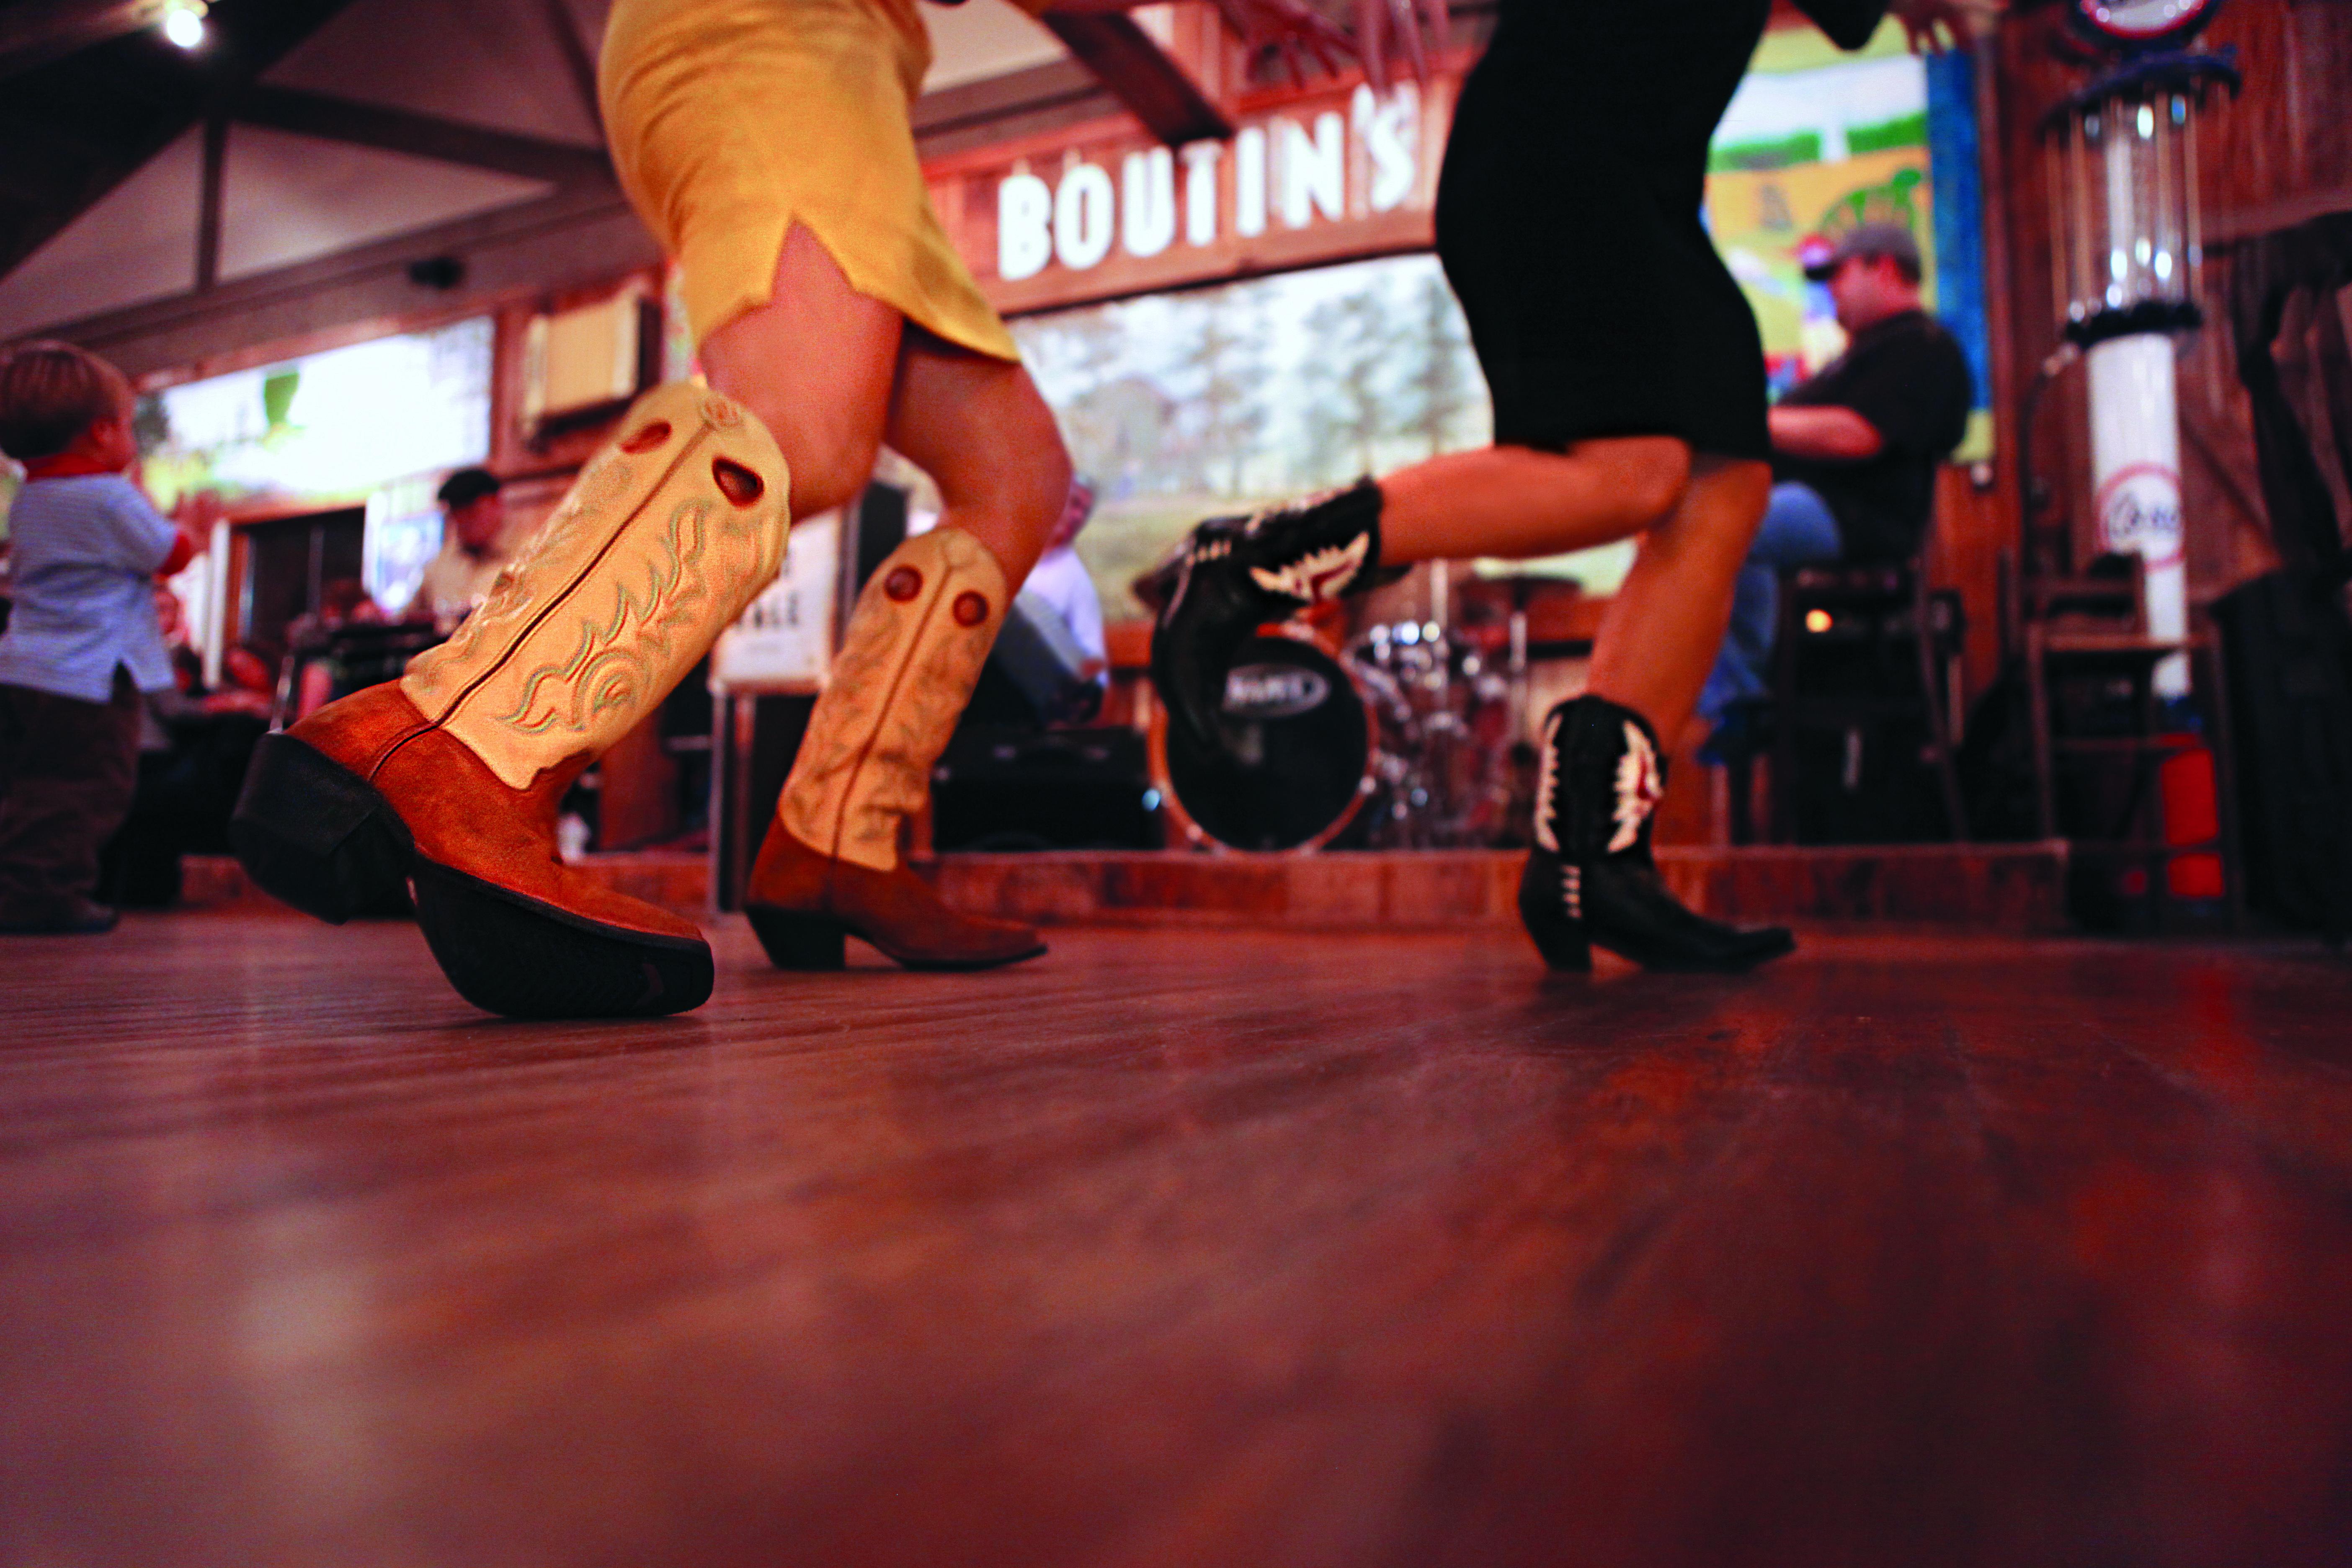 Dancing at boutins cajun restaurant south louisiana